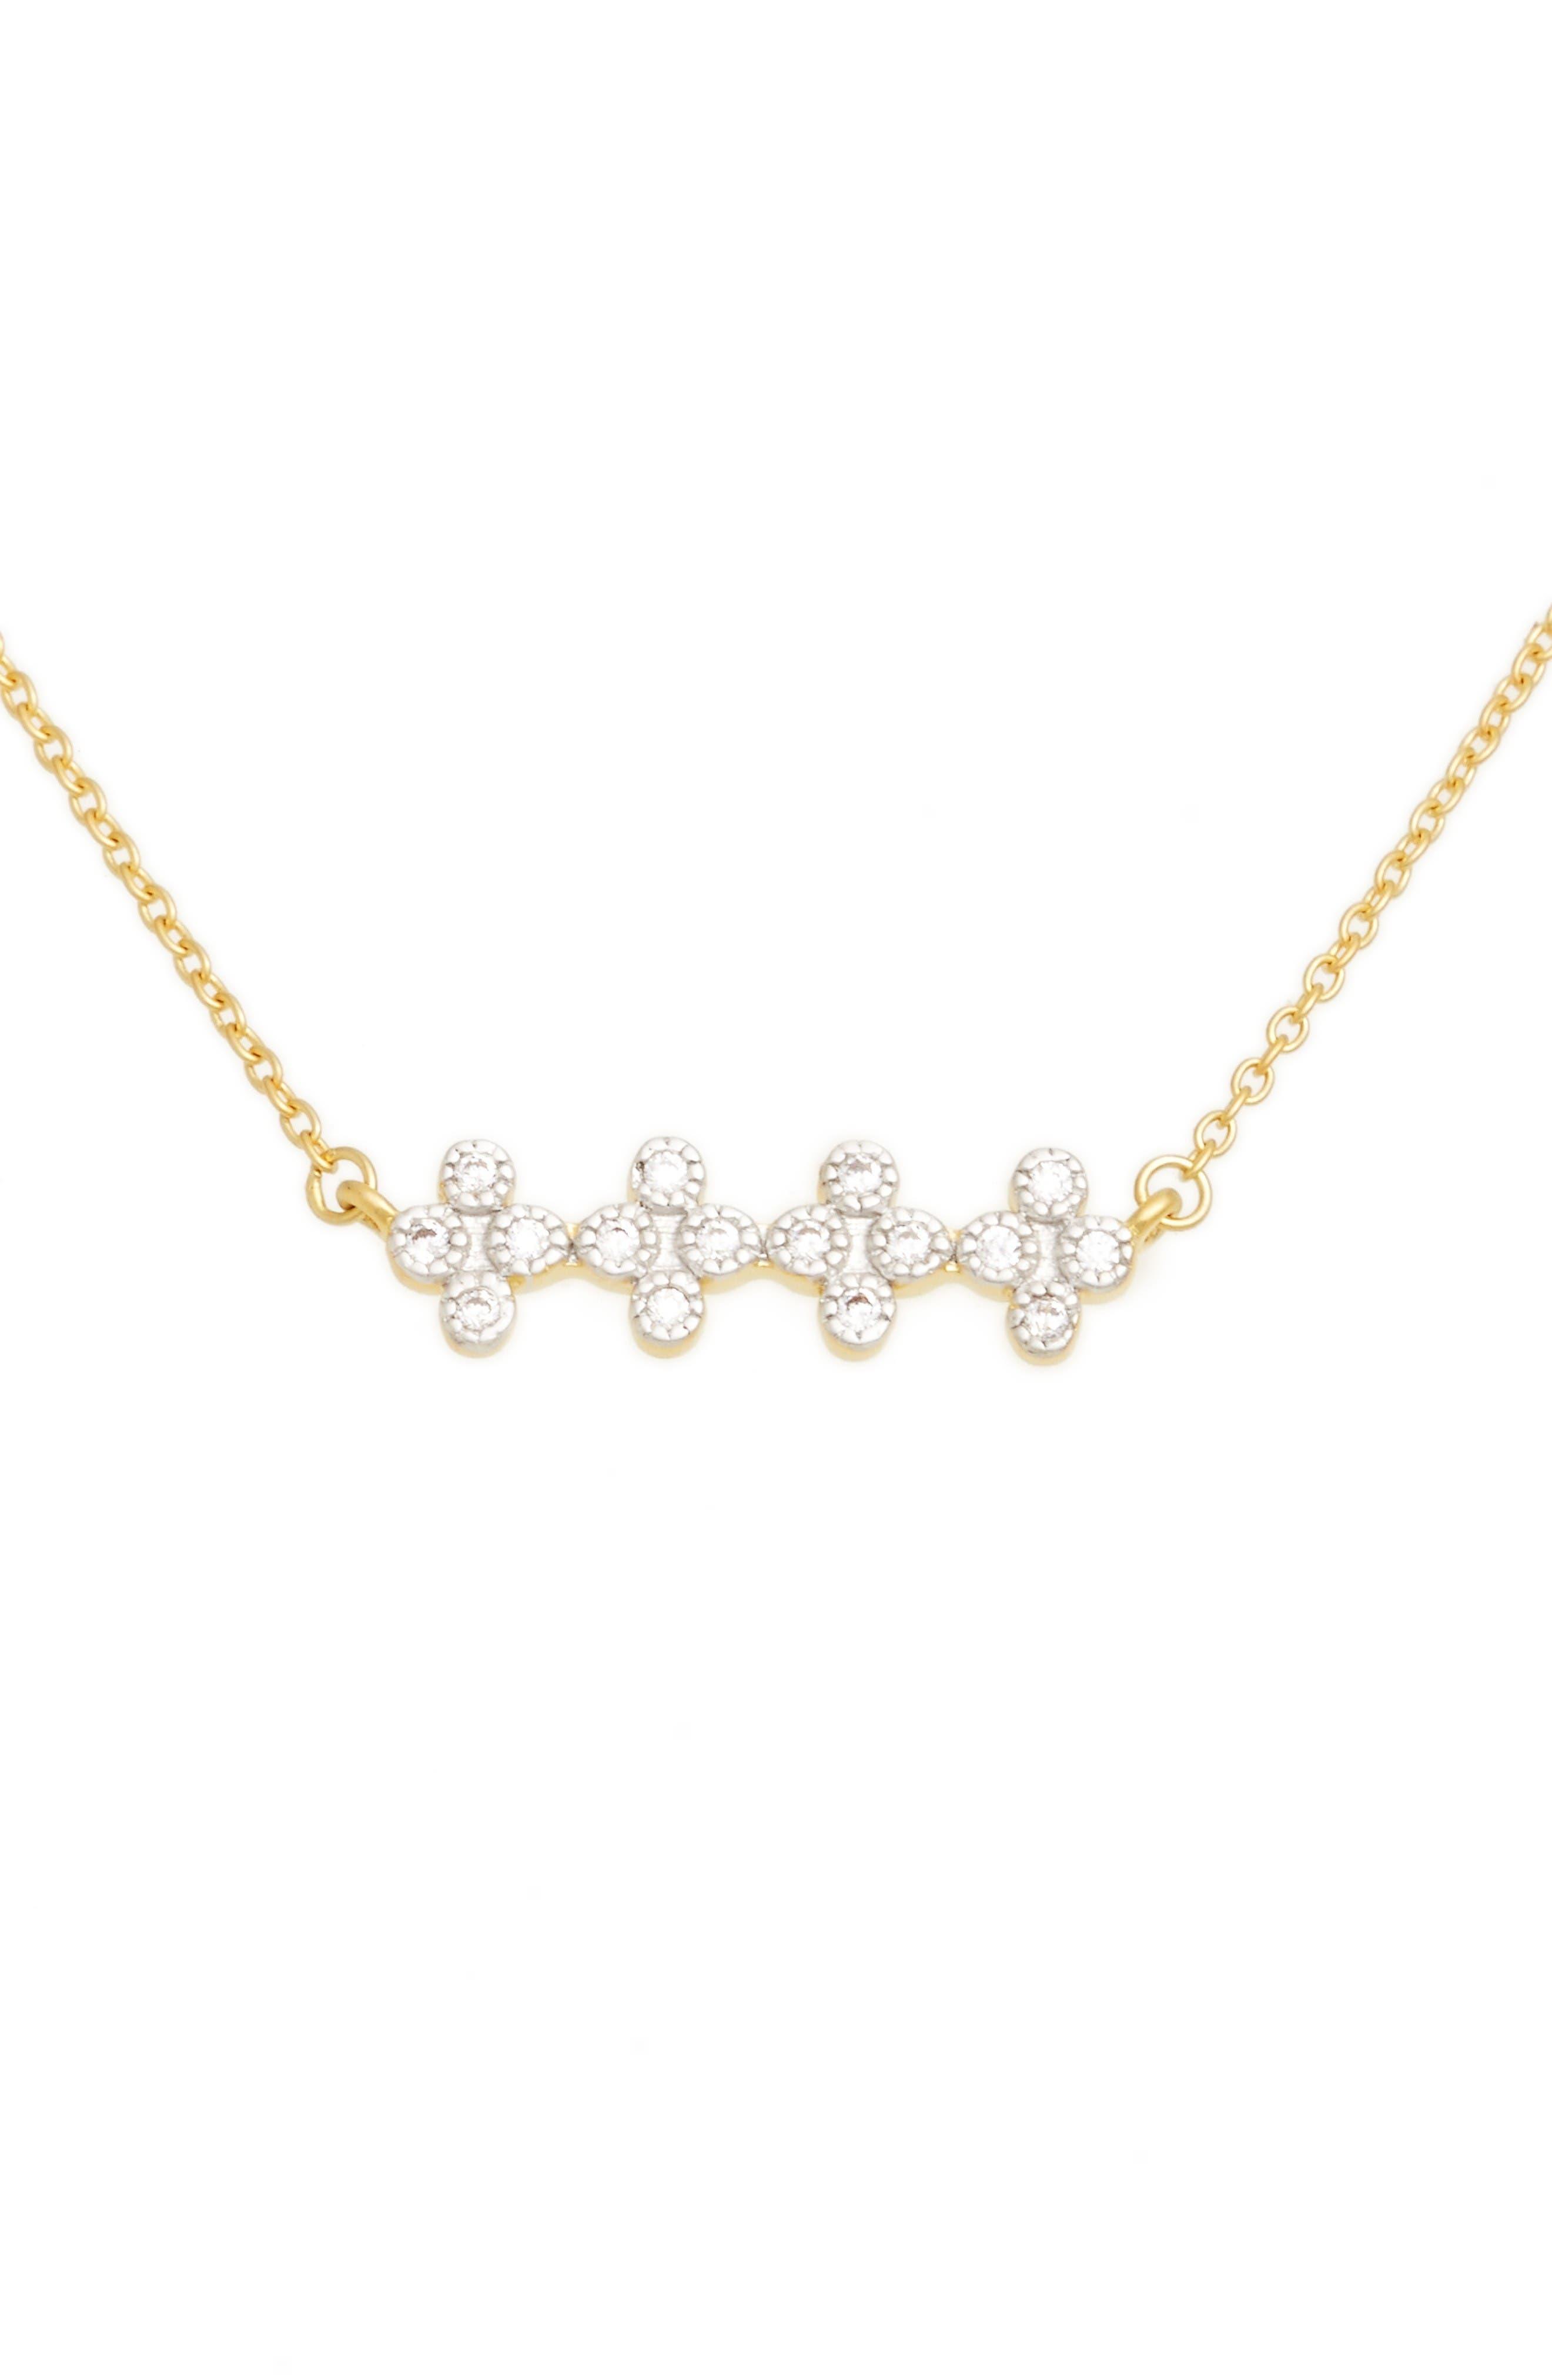 FREIDA ROTHMAN Visionary Fusion Crystal Necklace